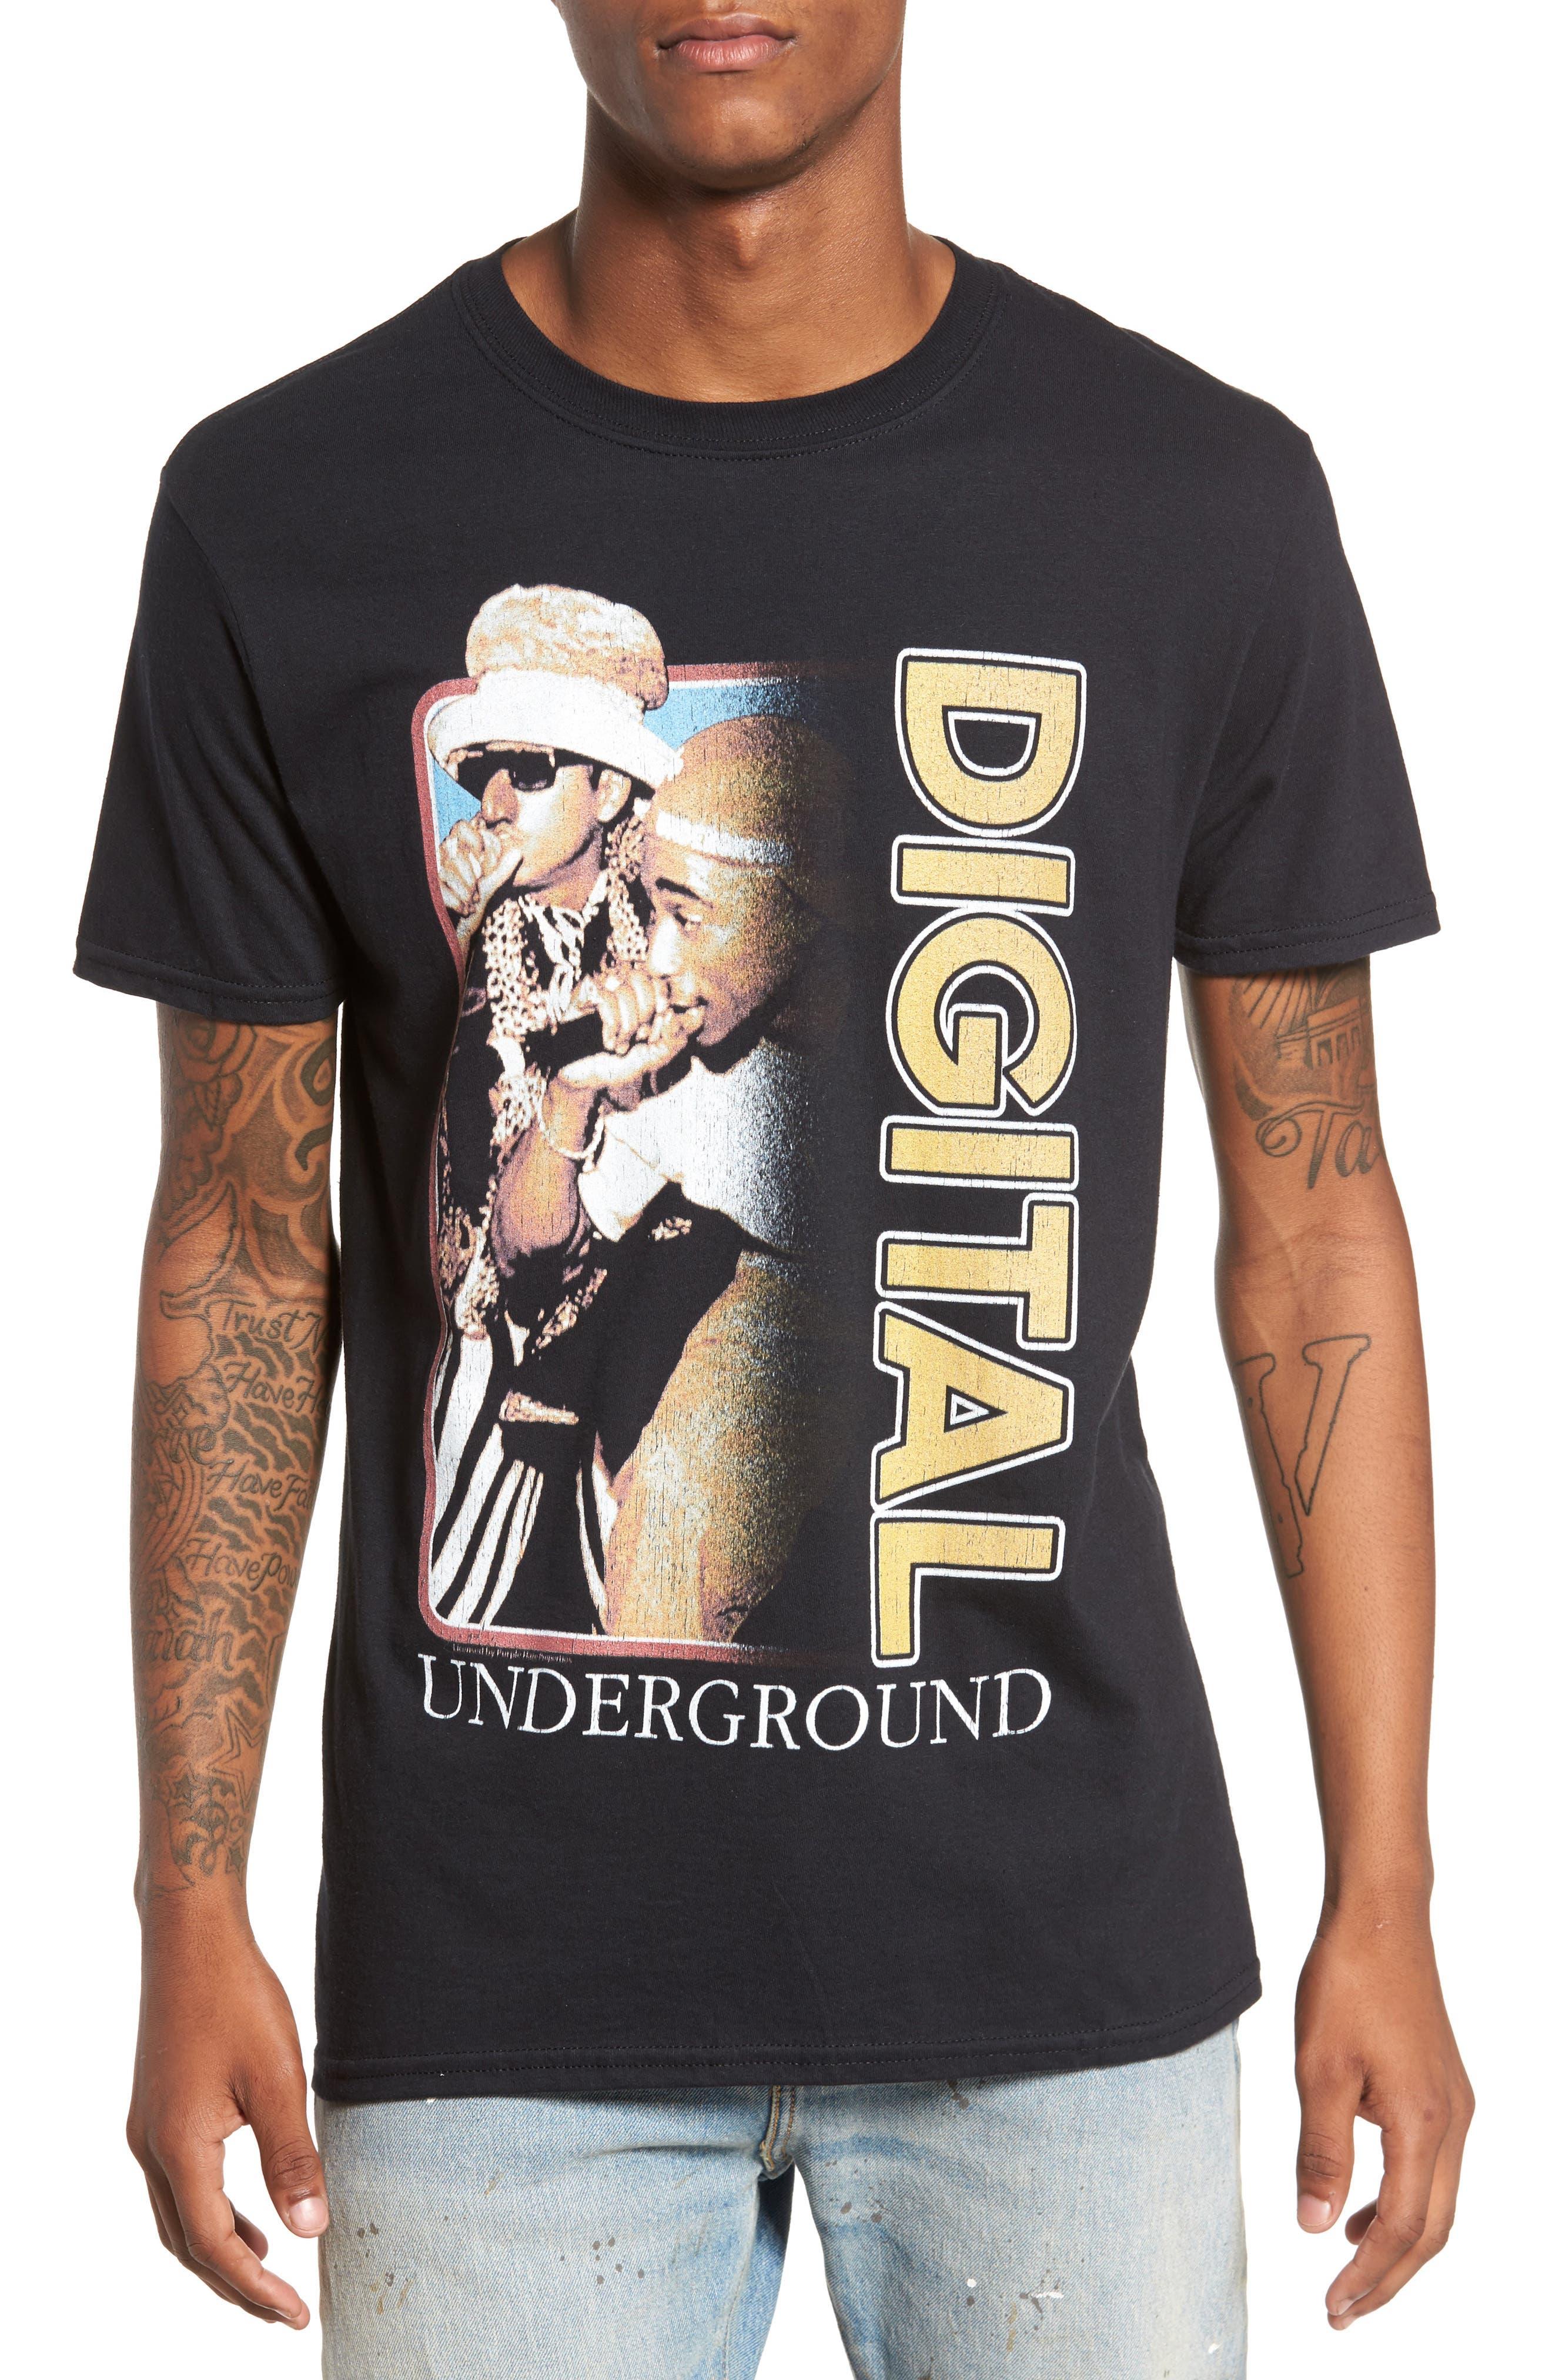 Digital Underground T-Shirt,                             Main thumbnail 1, color,                             001